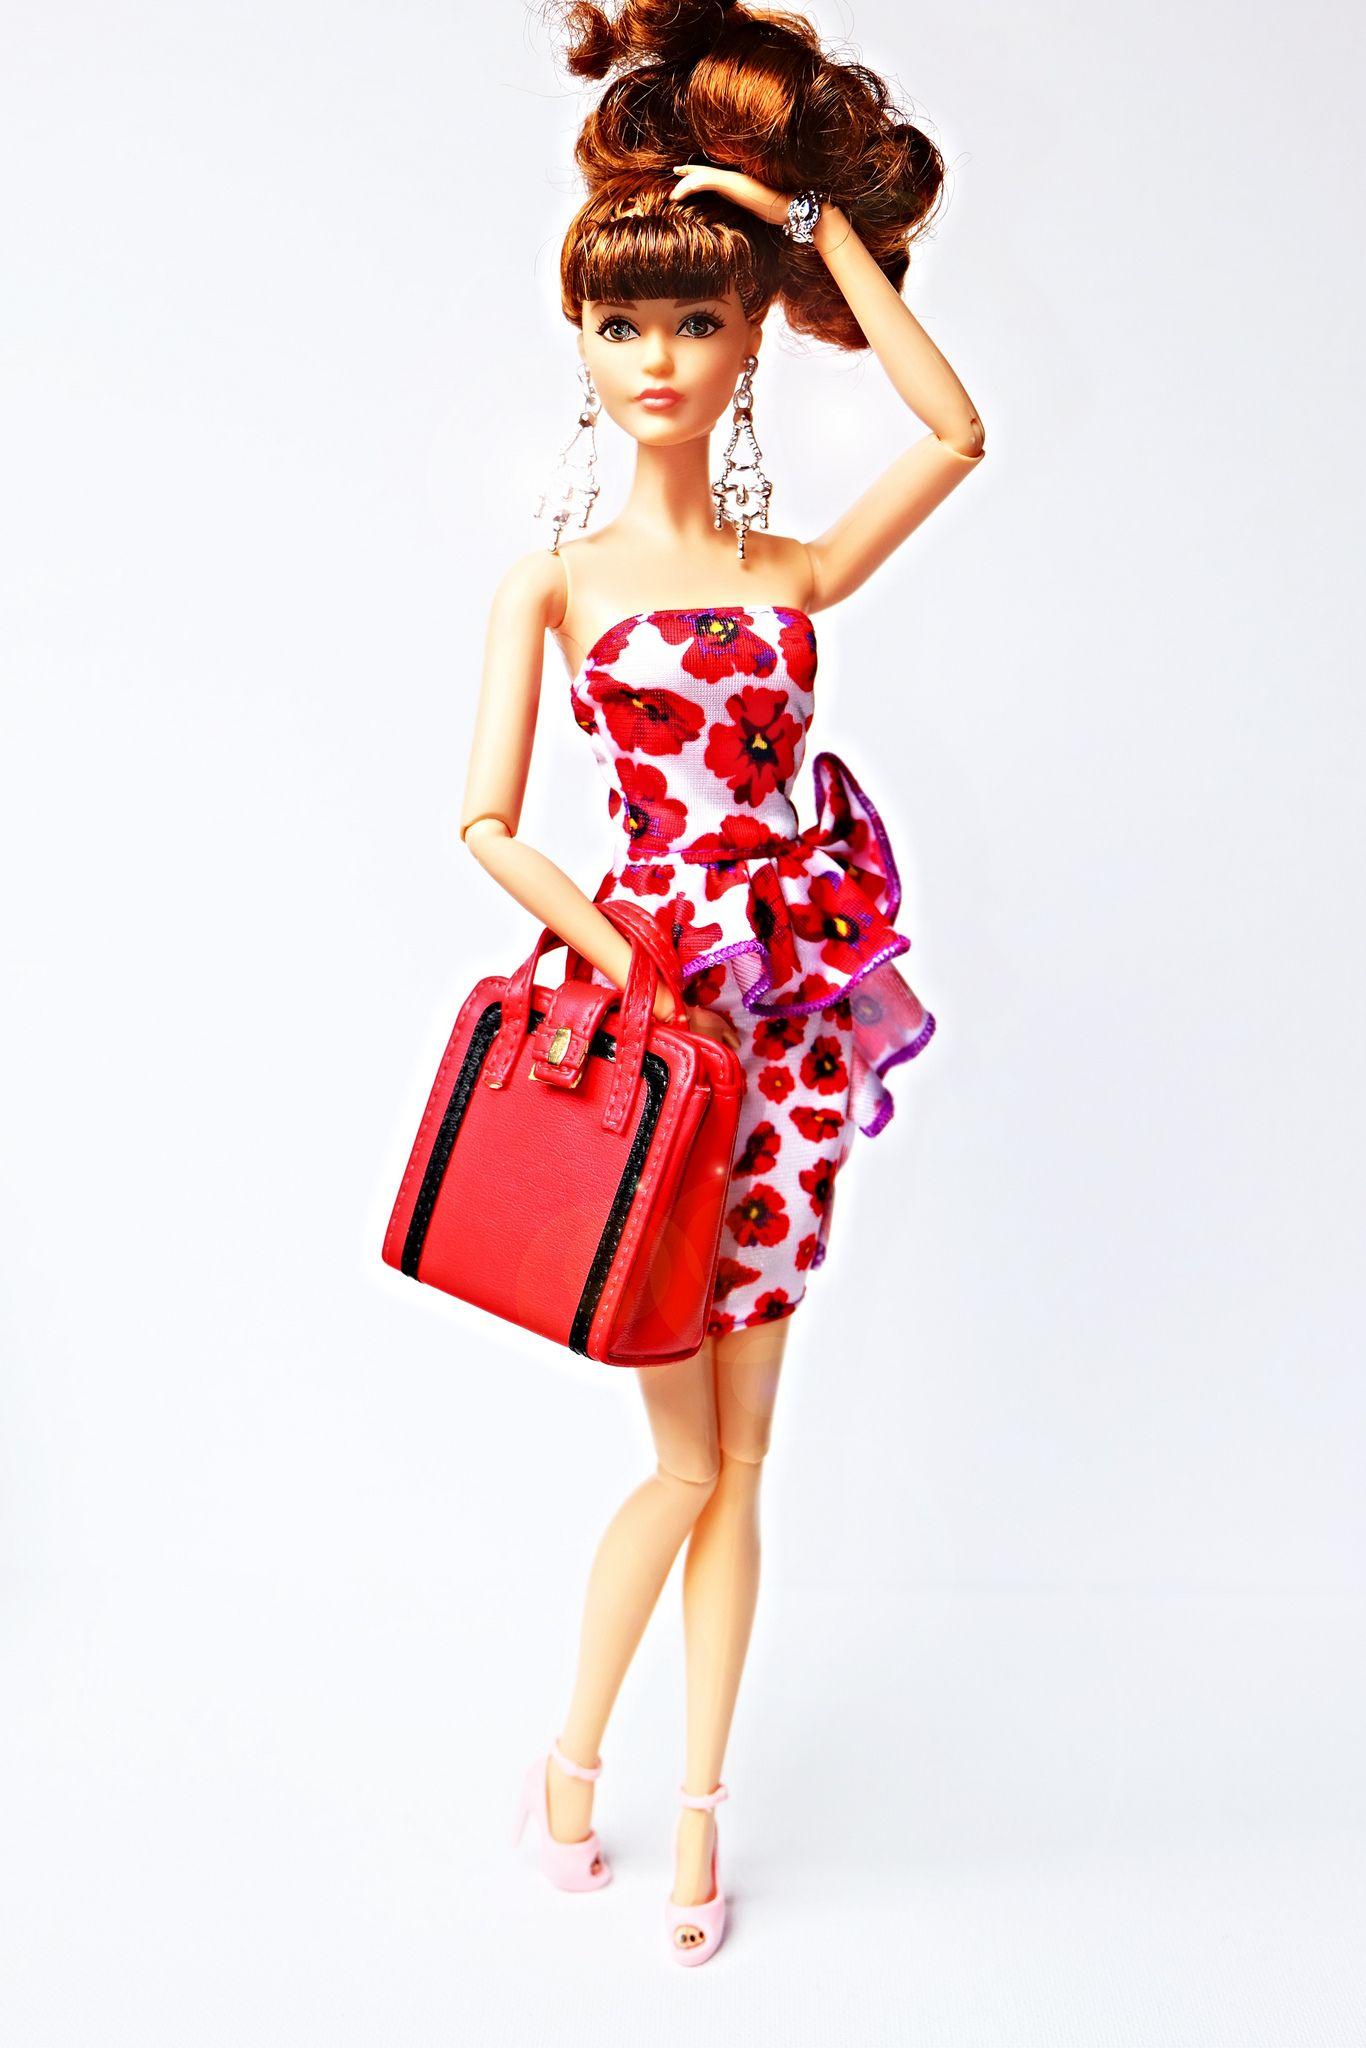 sweet lady sweet lady rh pinterest com